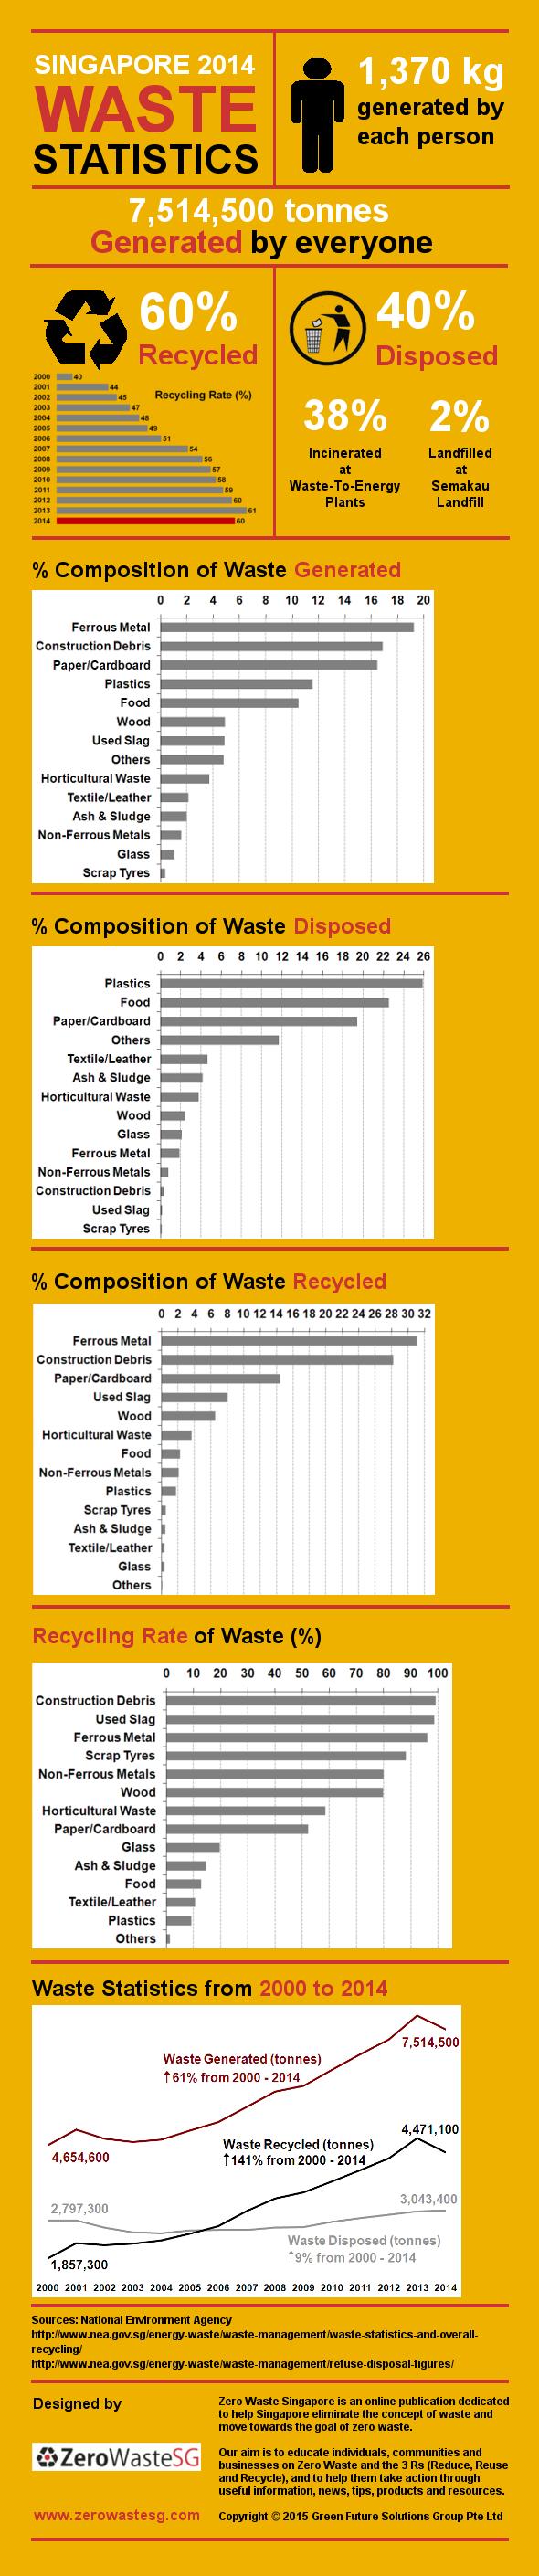 Singapore Waste Statistics 2014